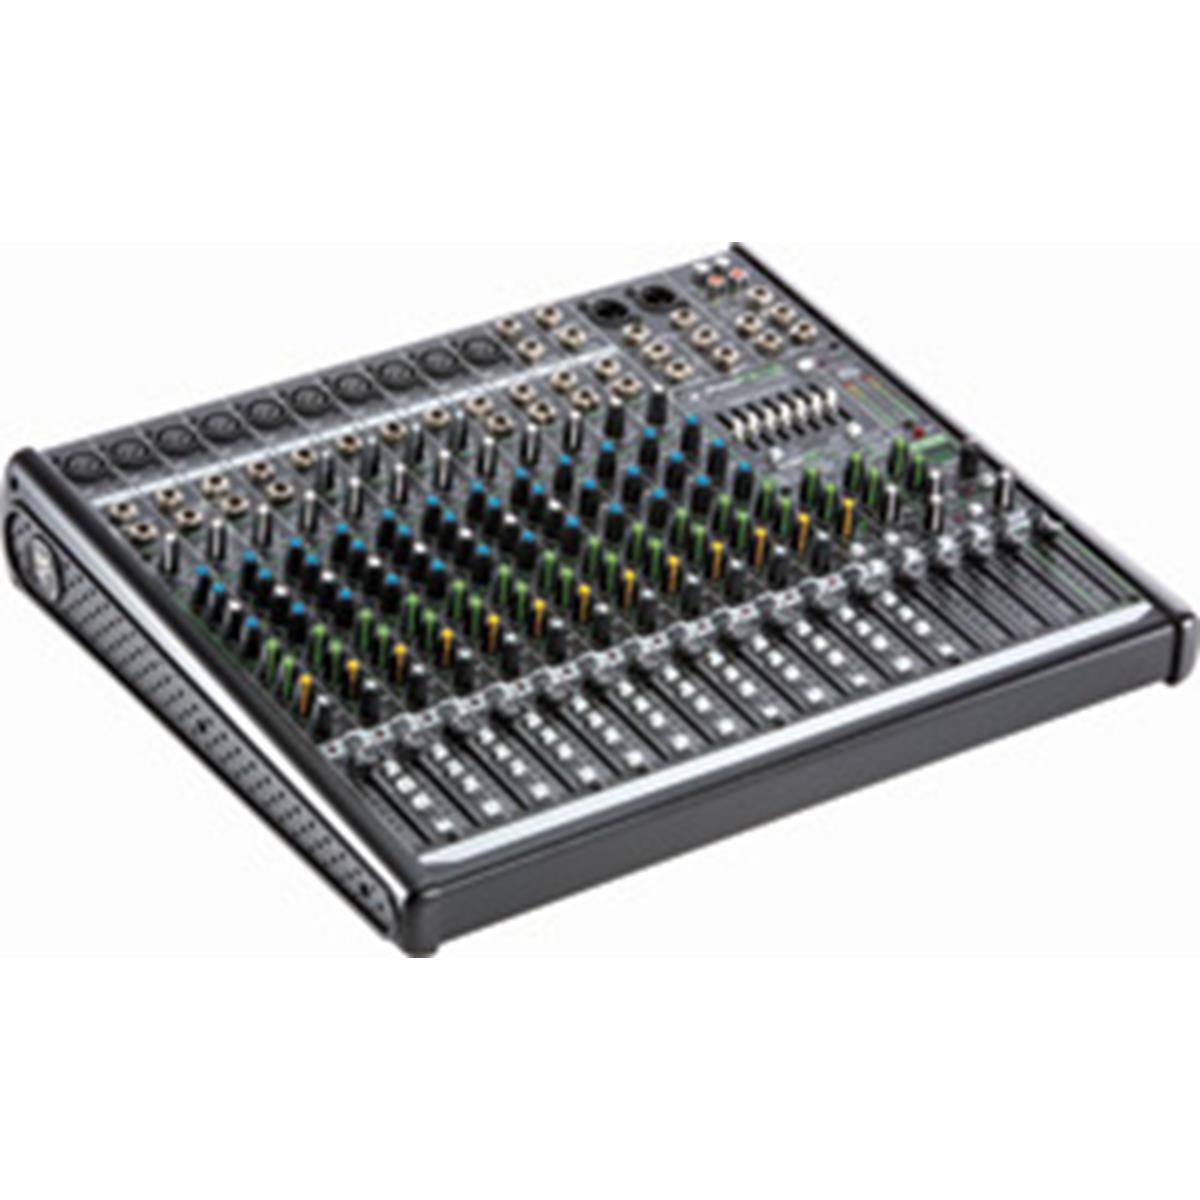 MACKIE-PROFX-16-V2-MIXER-sku-14999